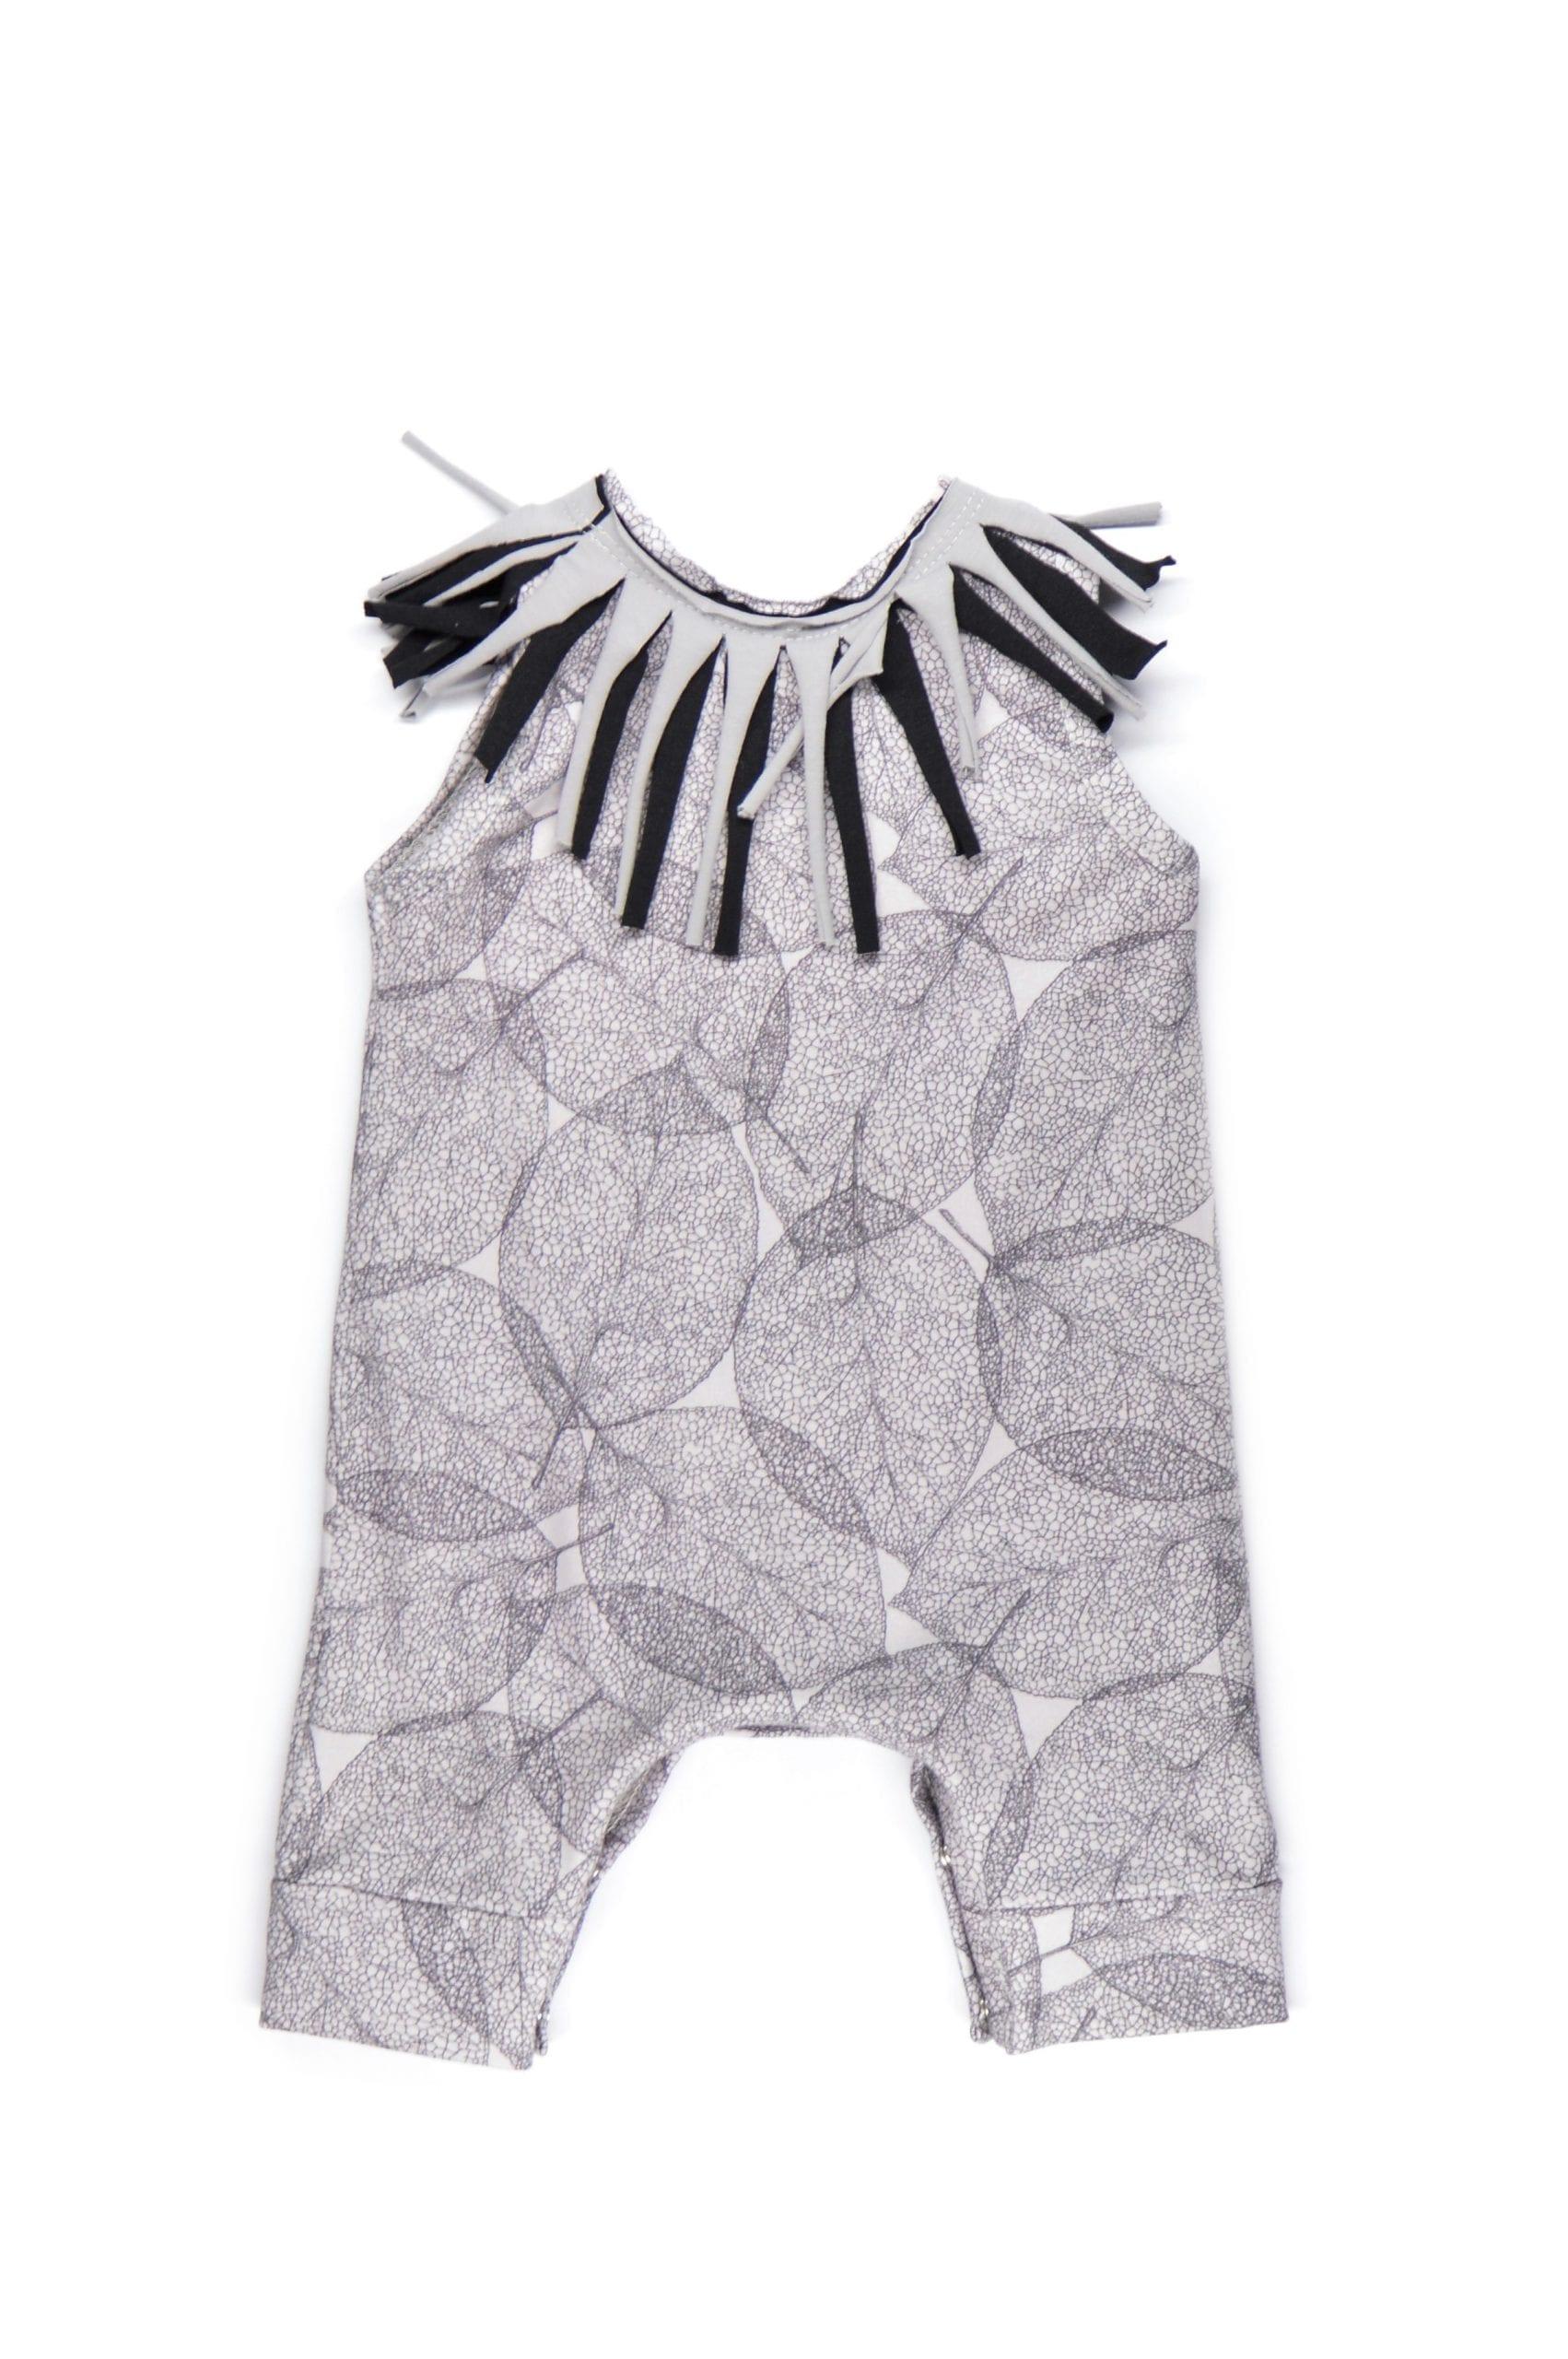 Unisex baby leaf romper with fringe for kids, toddlers, girl, boy